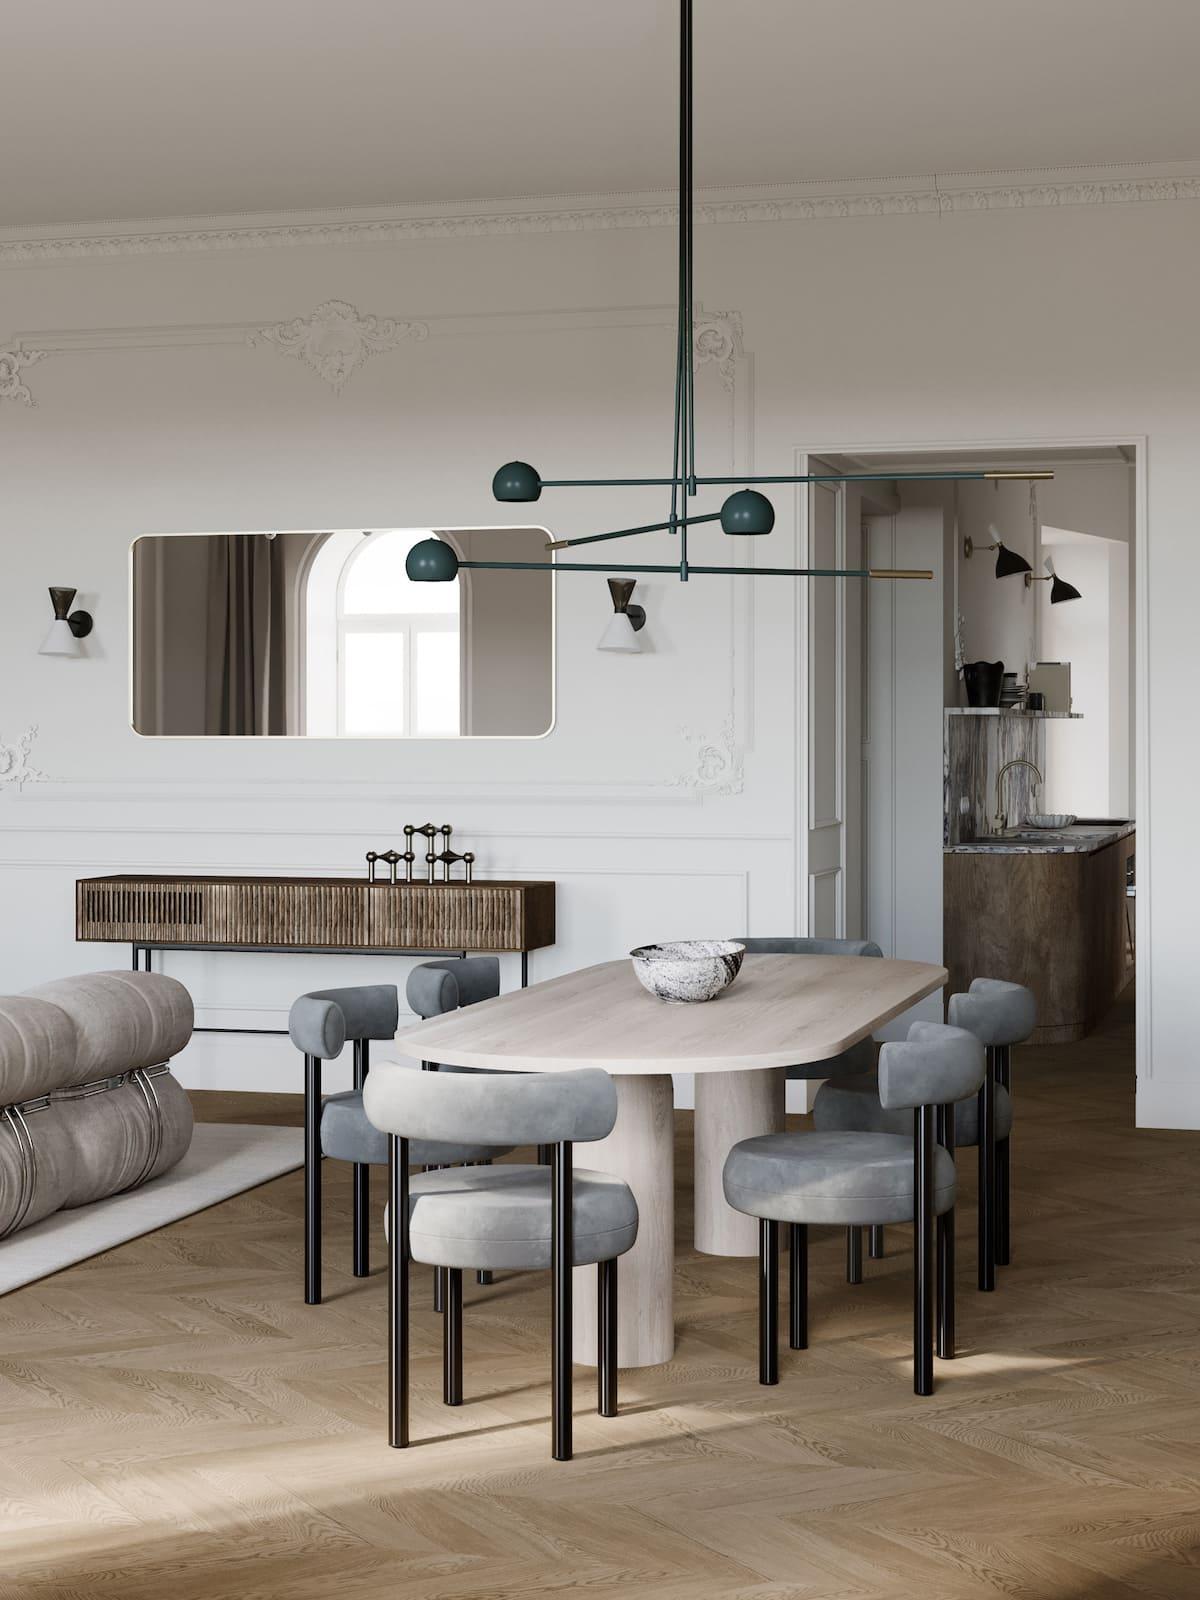 модный дизайн интерьера квартиры фото 16